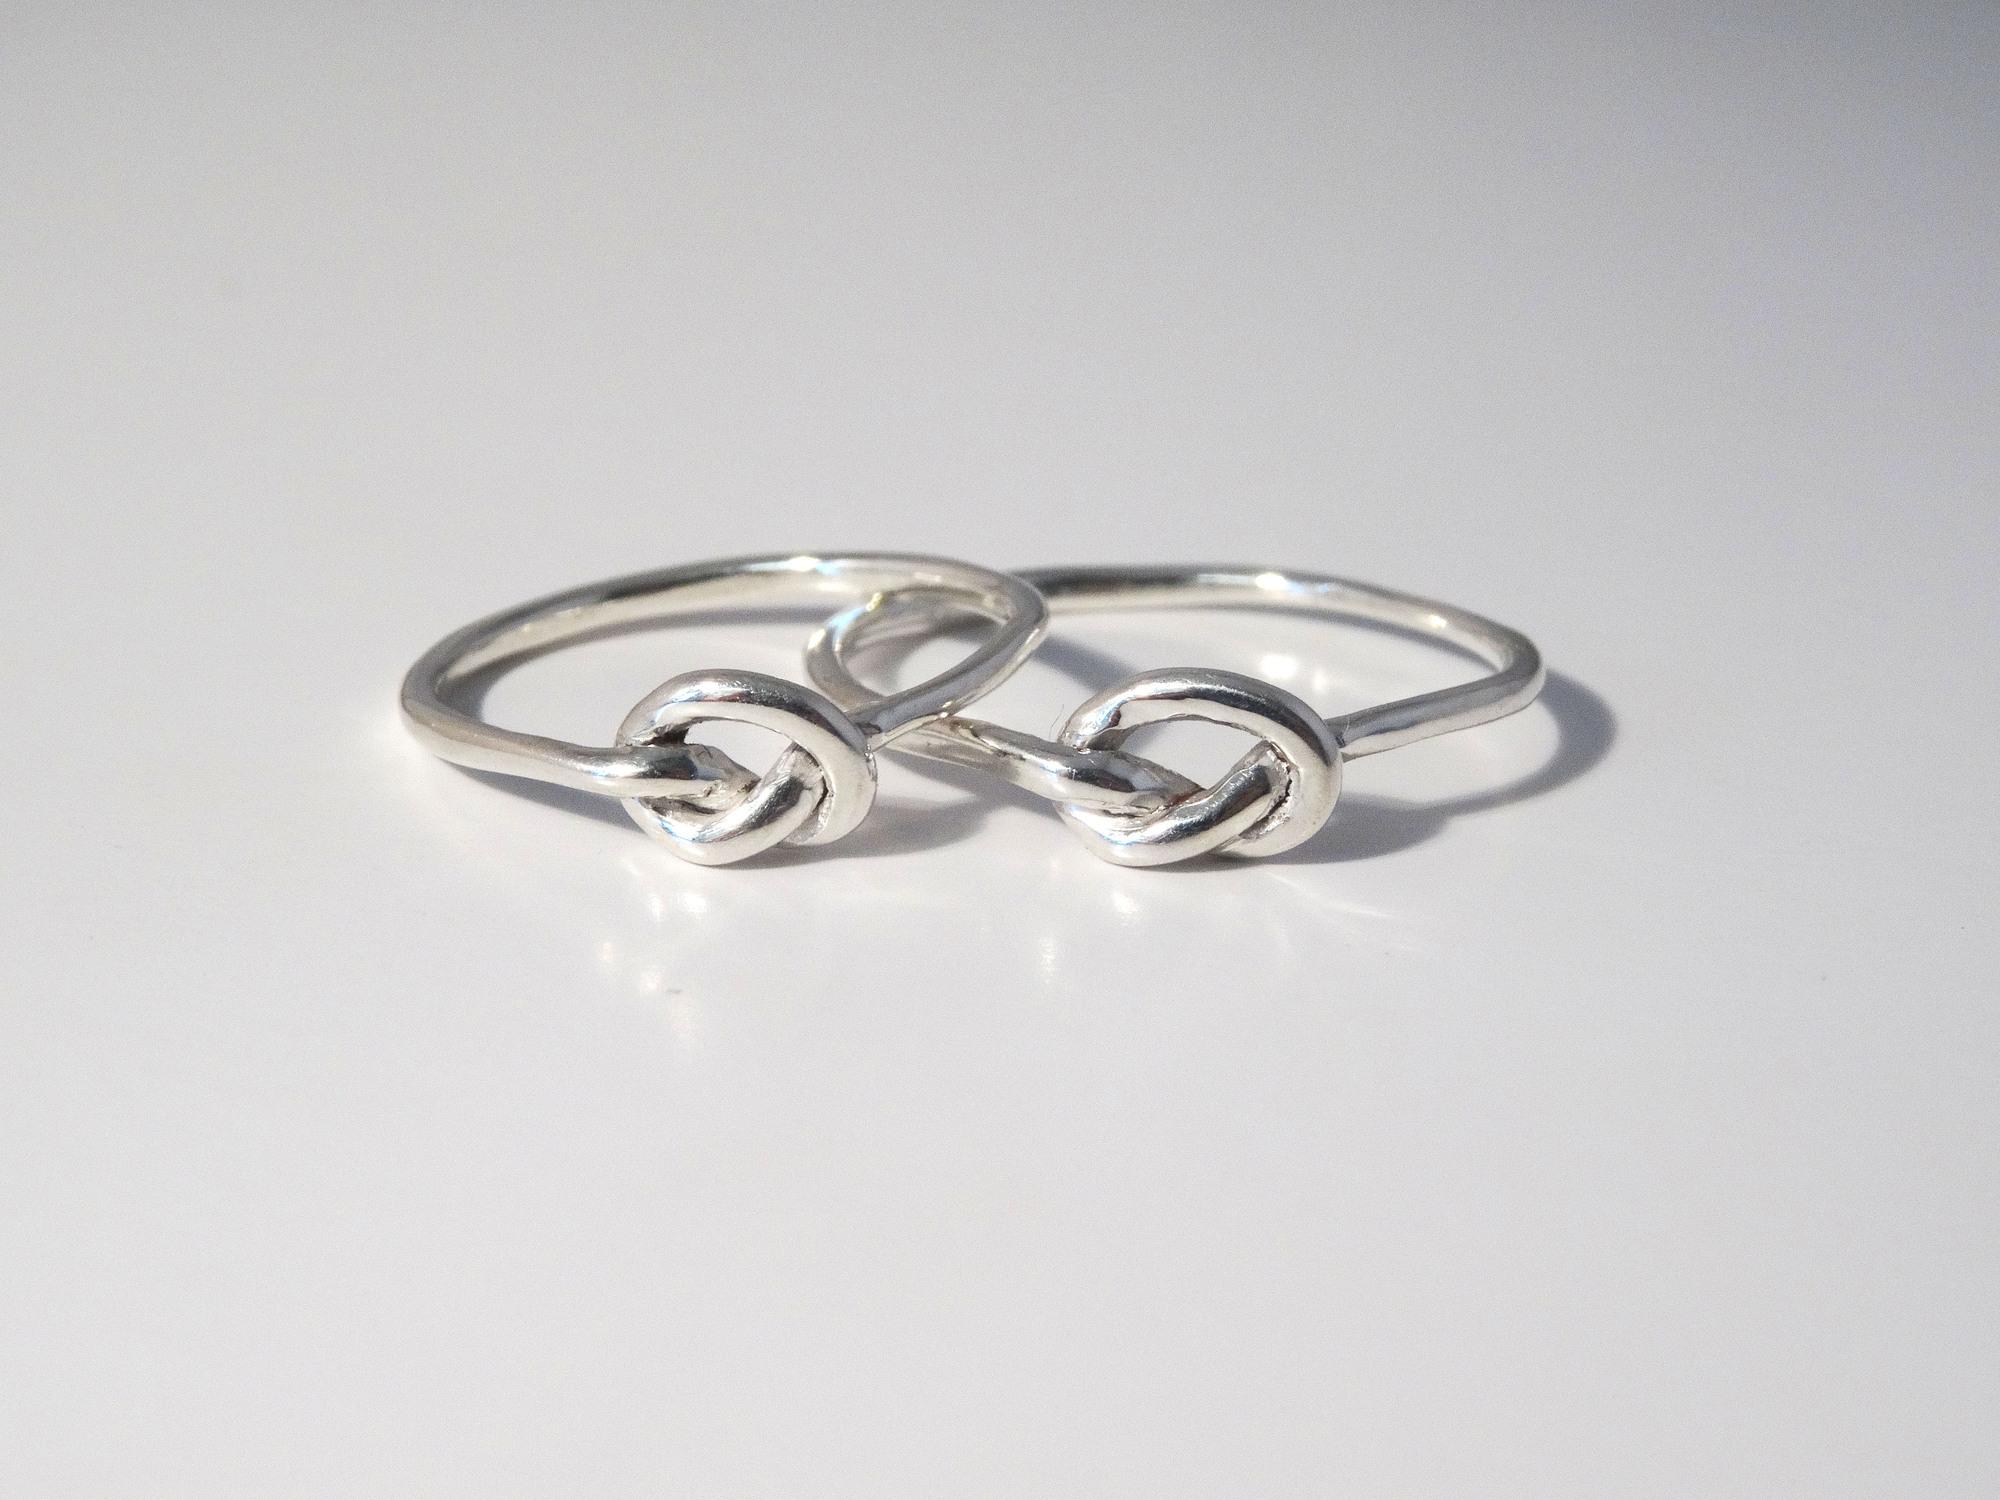 knot rings 350dpi 5000pix.jpg